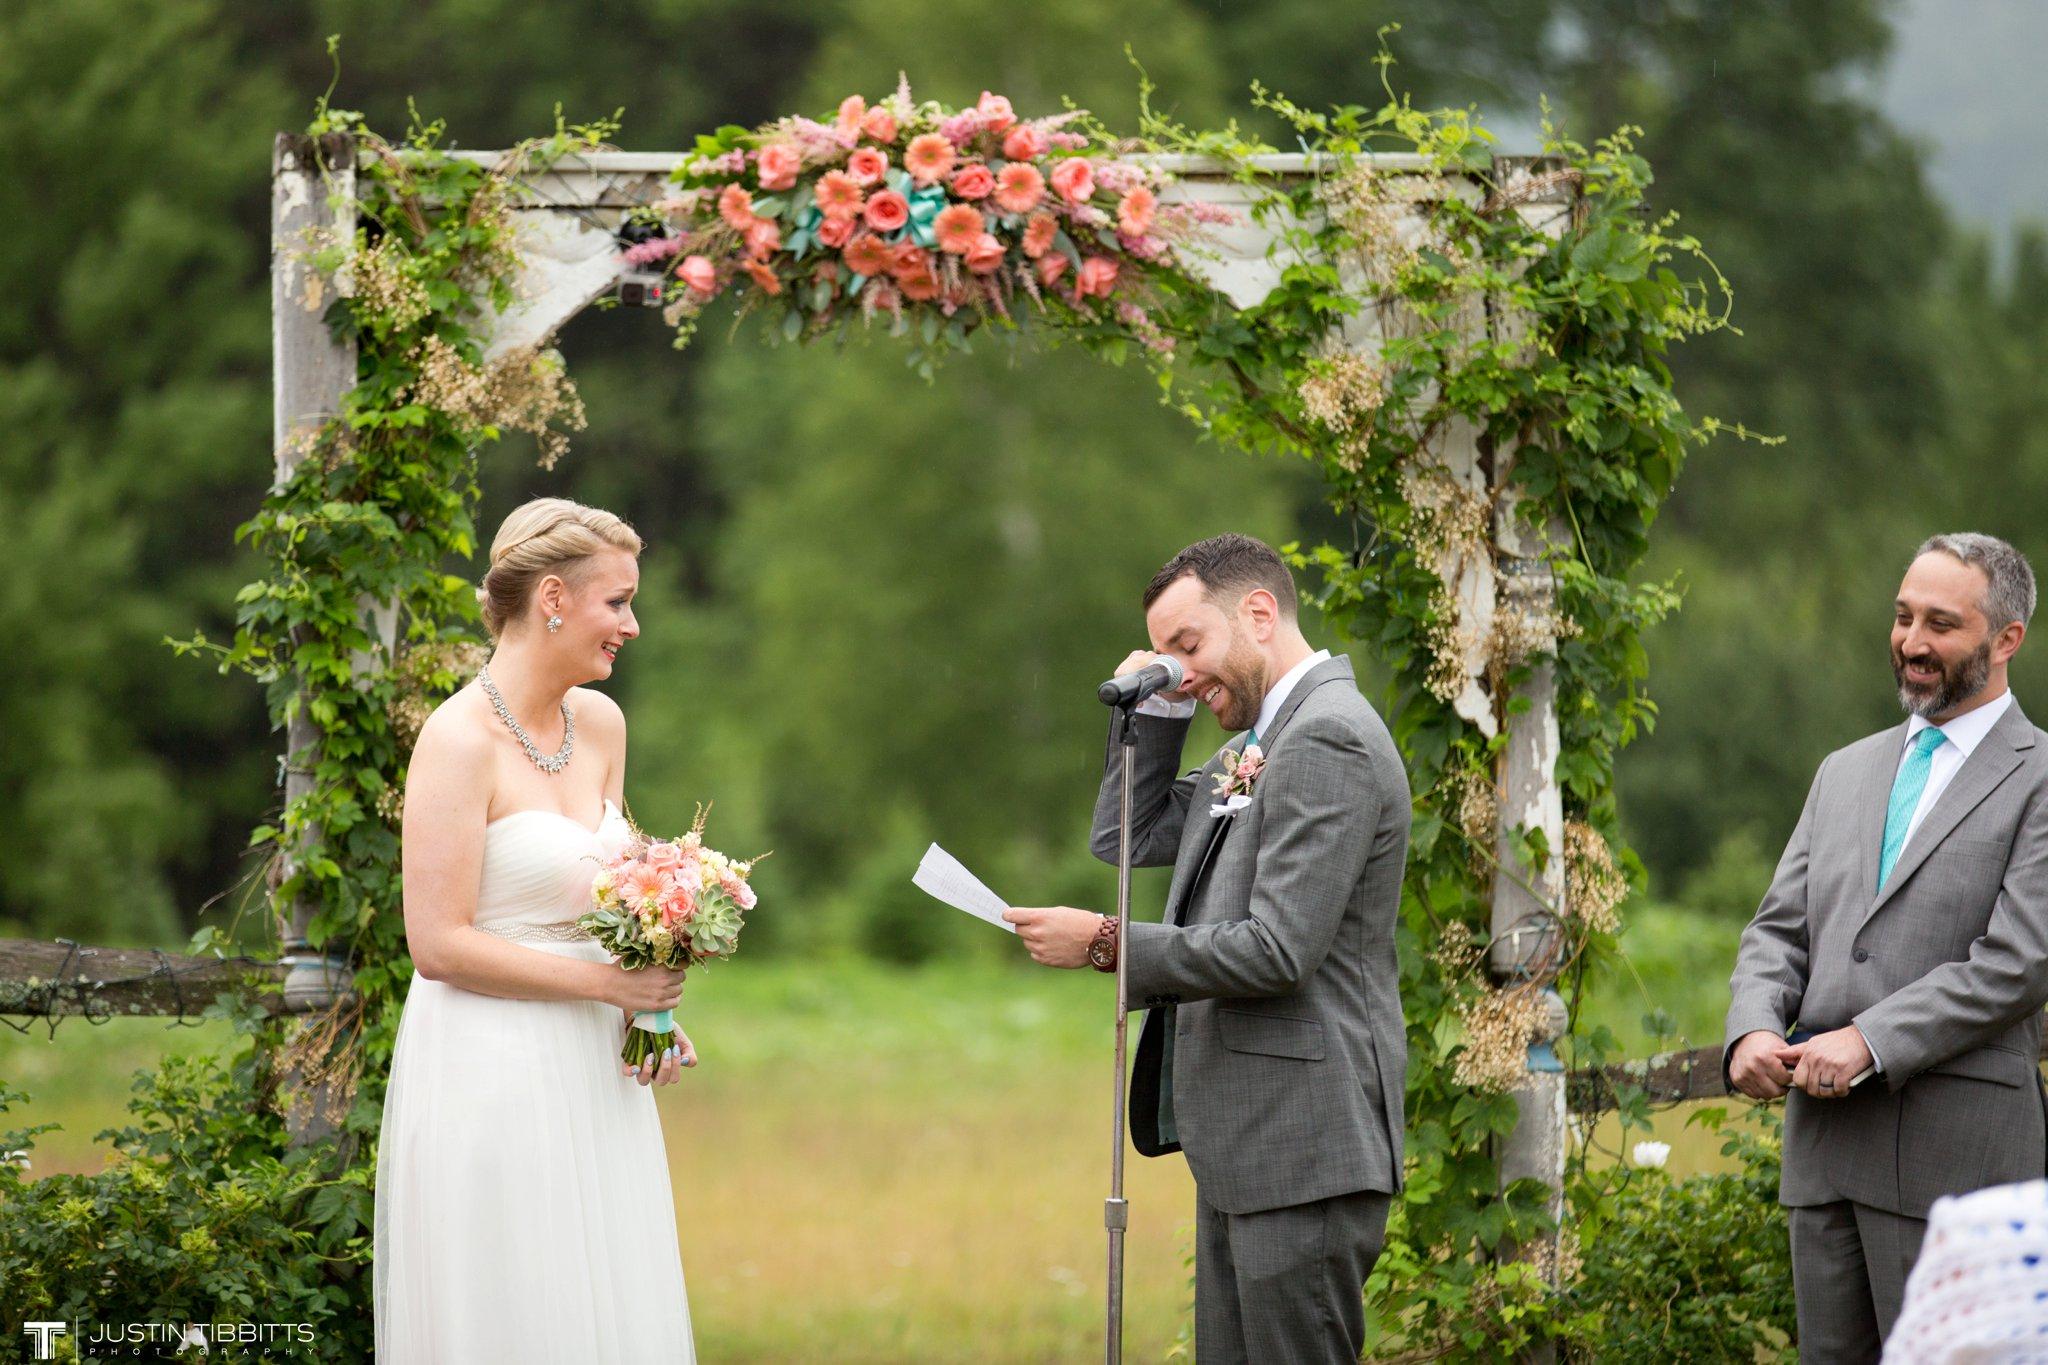 burlap-and-beams-wedding-photos-with-joran-and-molly_0068